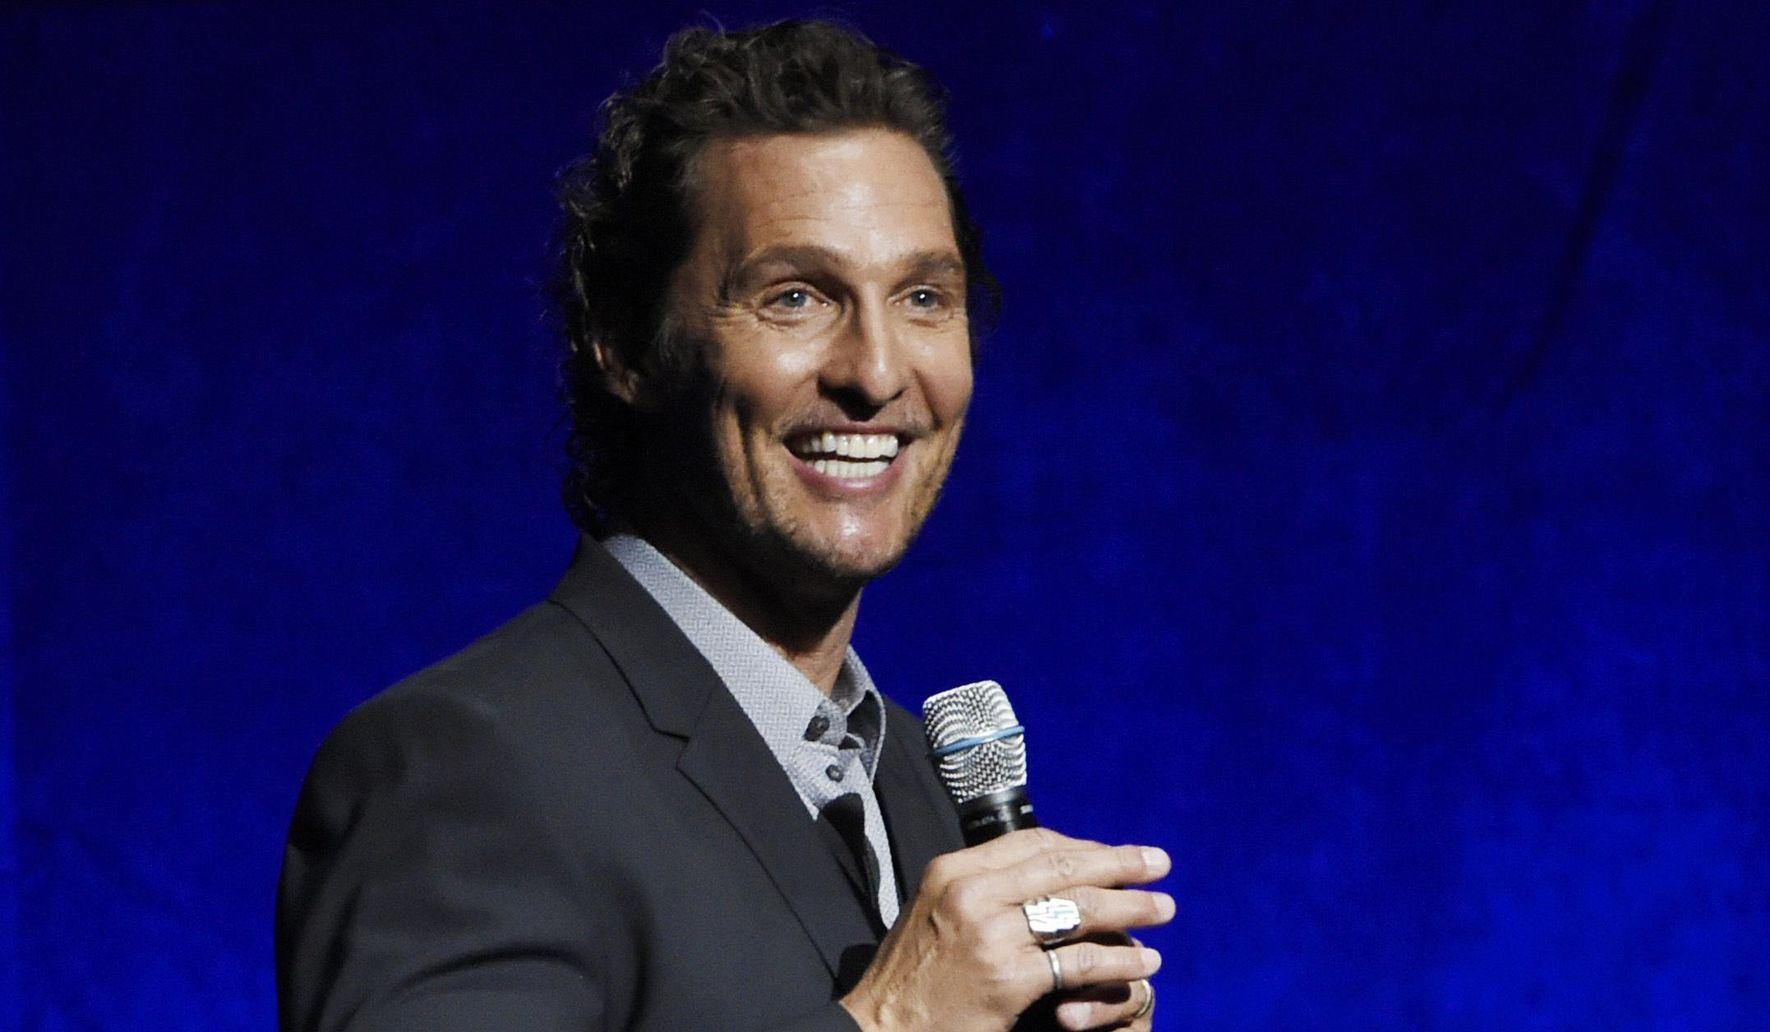 Matthew McConaughey joins University of Texas as professor